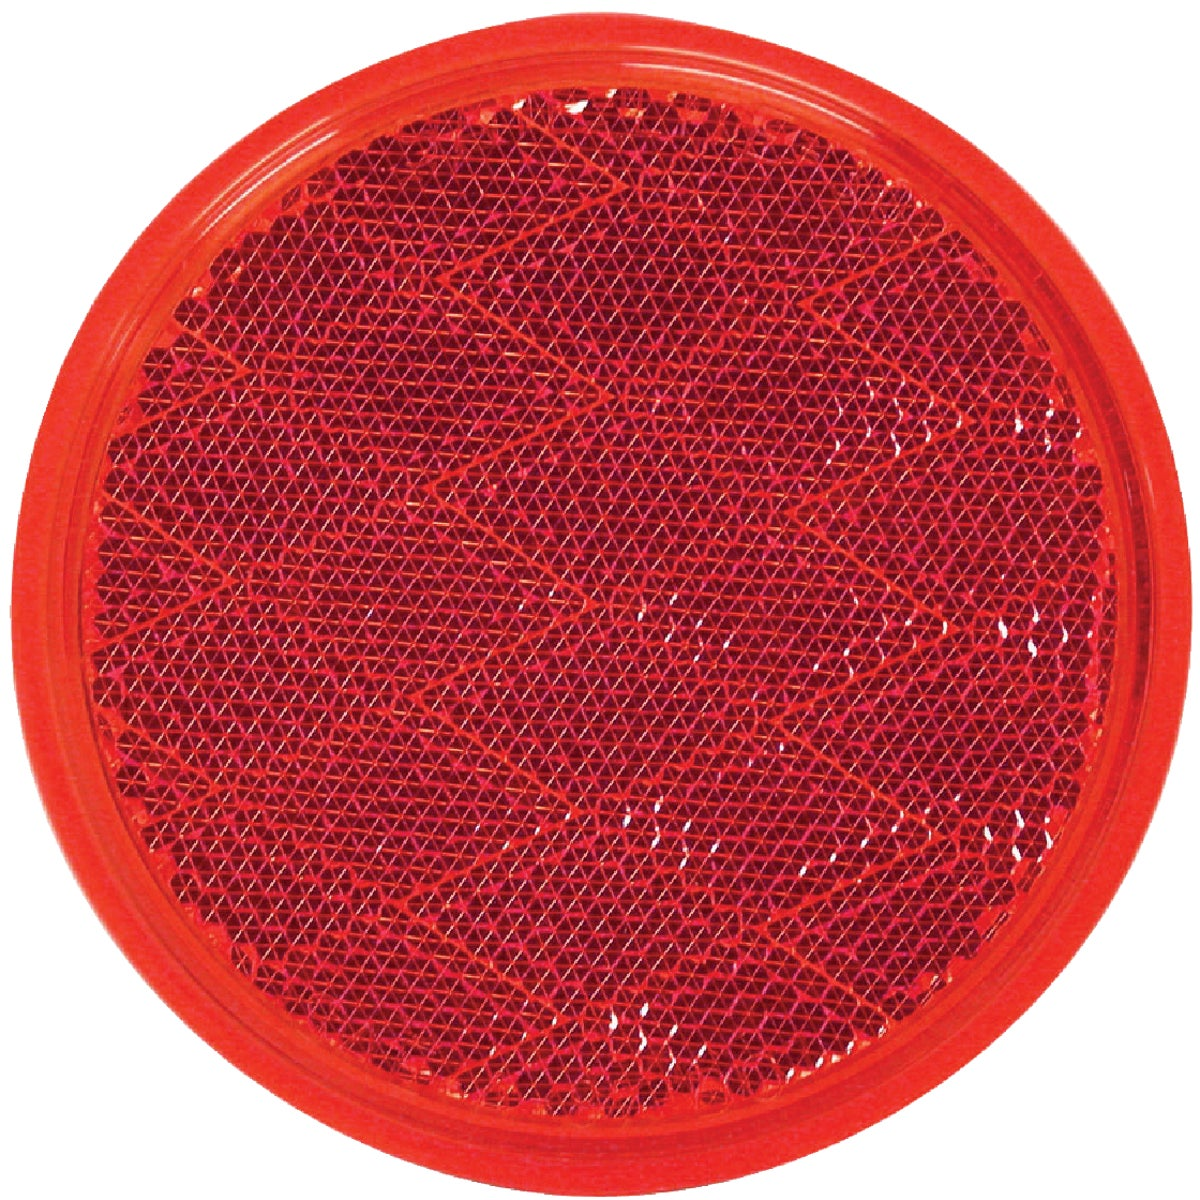 Red Round Reflector